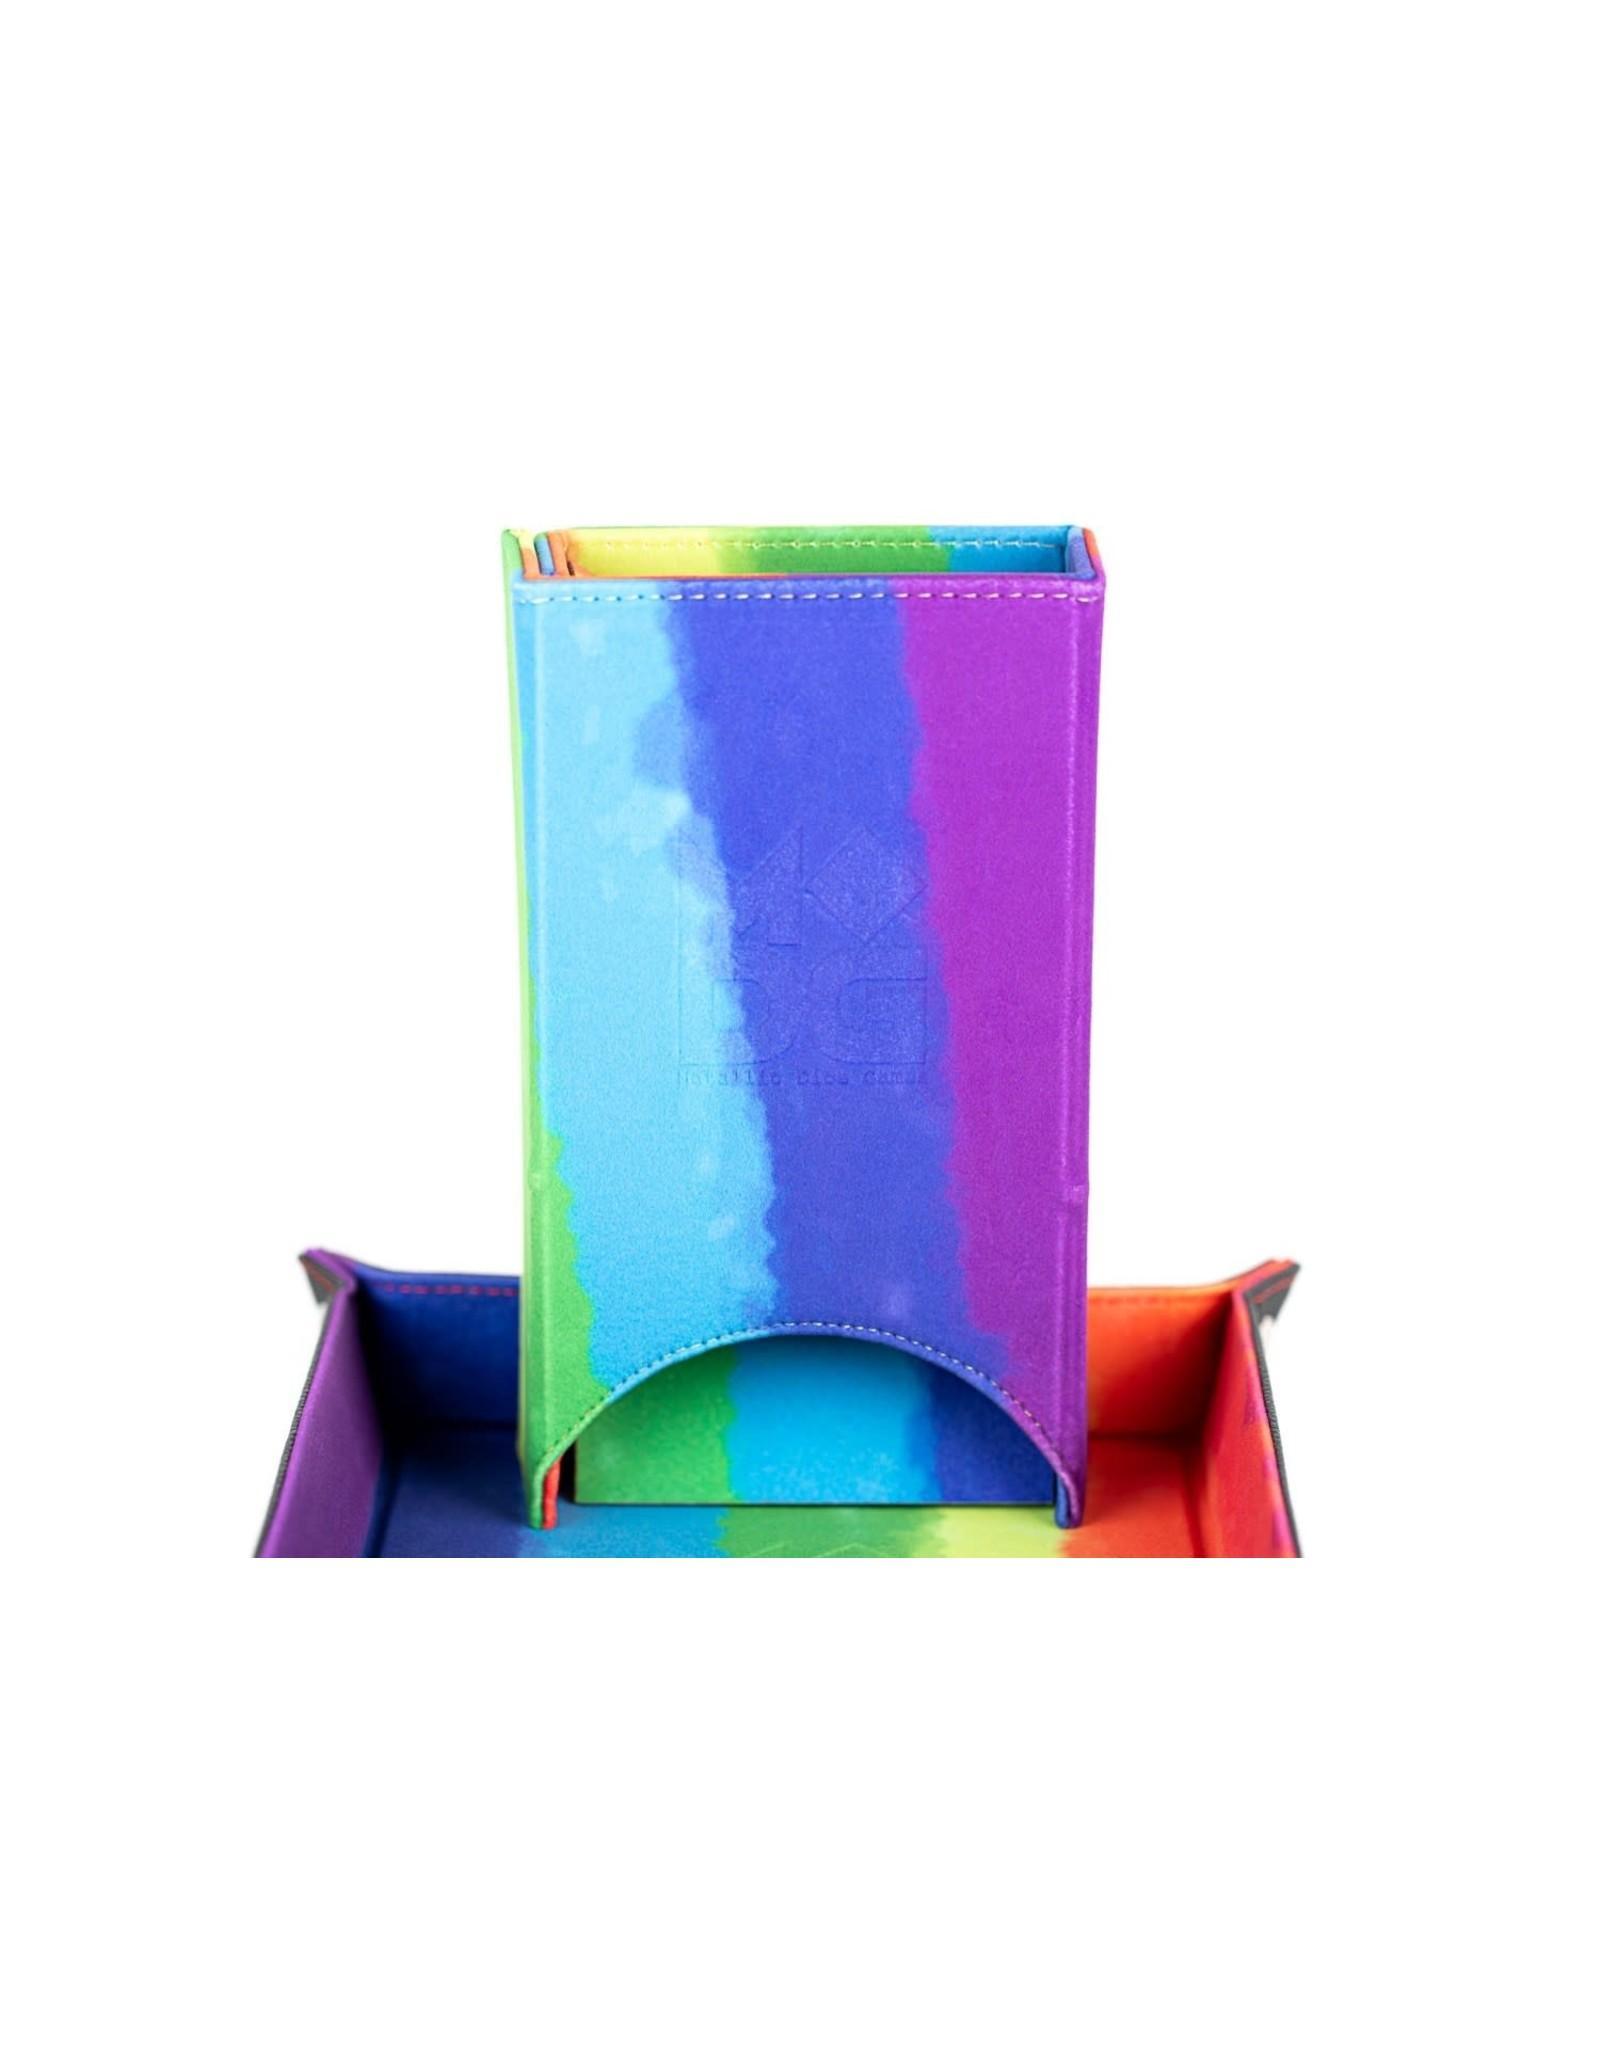 Metallic Dice Games Velvet Fold Up Dice Tower: Watercolor Rainbow